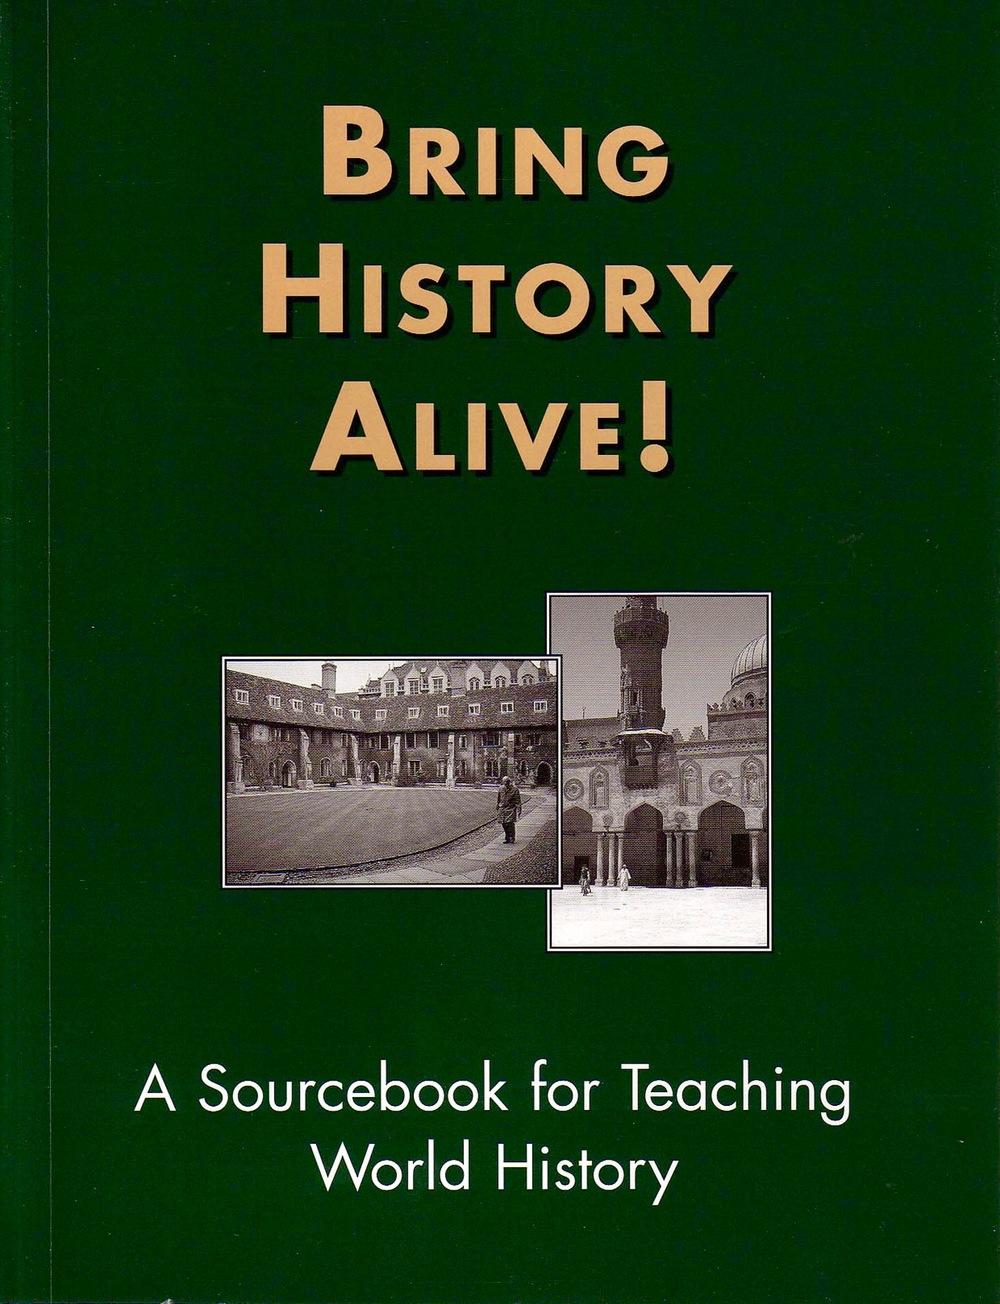 Bring History Alive!